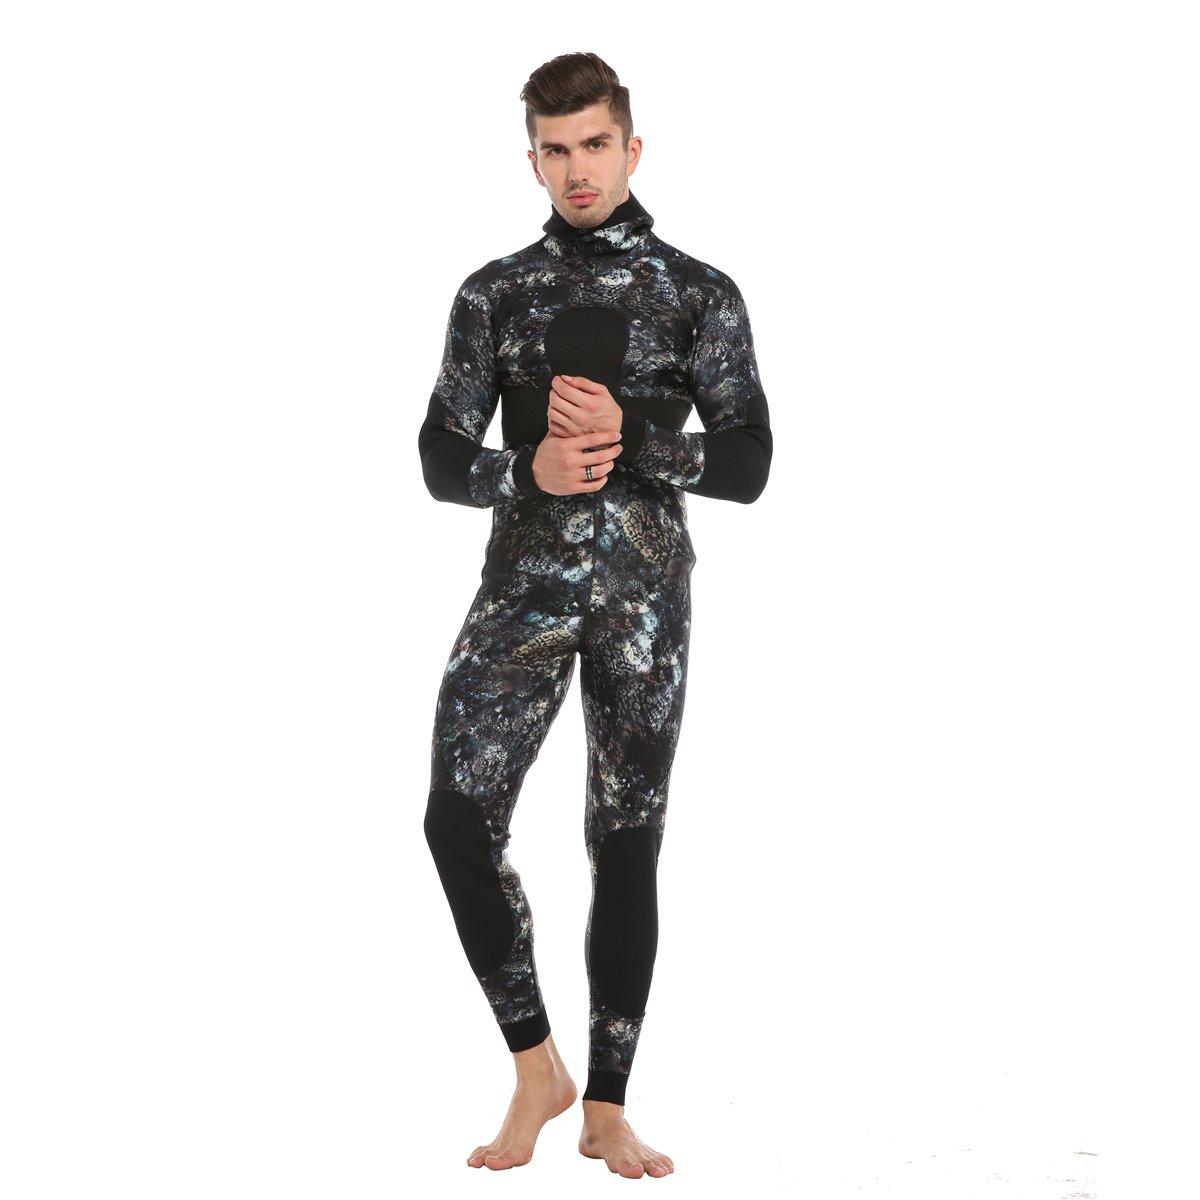 sportmars 3 mm & 5 mm Coral Camouflage分割ウェットスーツKeep Warm DeepシュノーケリングサーフウェットスーツHunting魚Outfit forメンズ&レディース B07DK5G74F 5mm Large